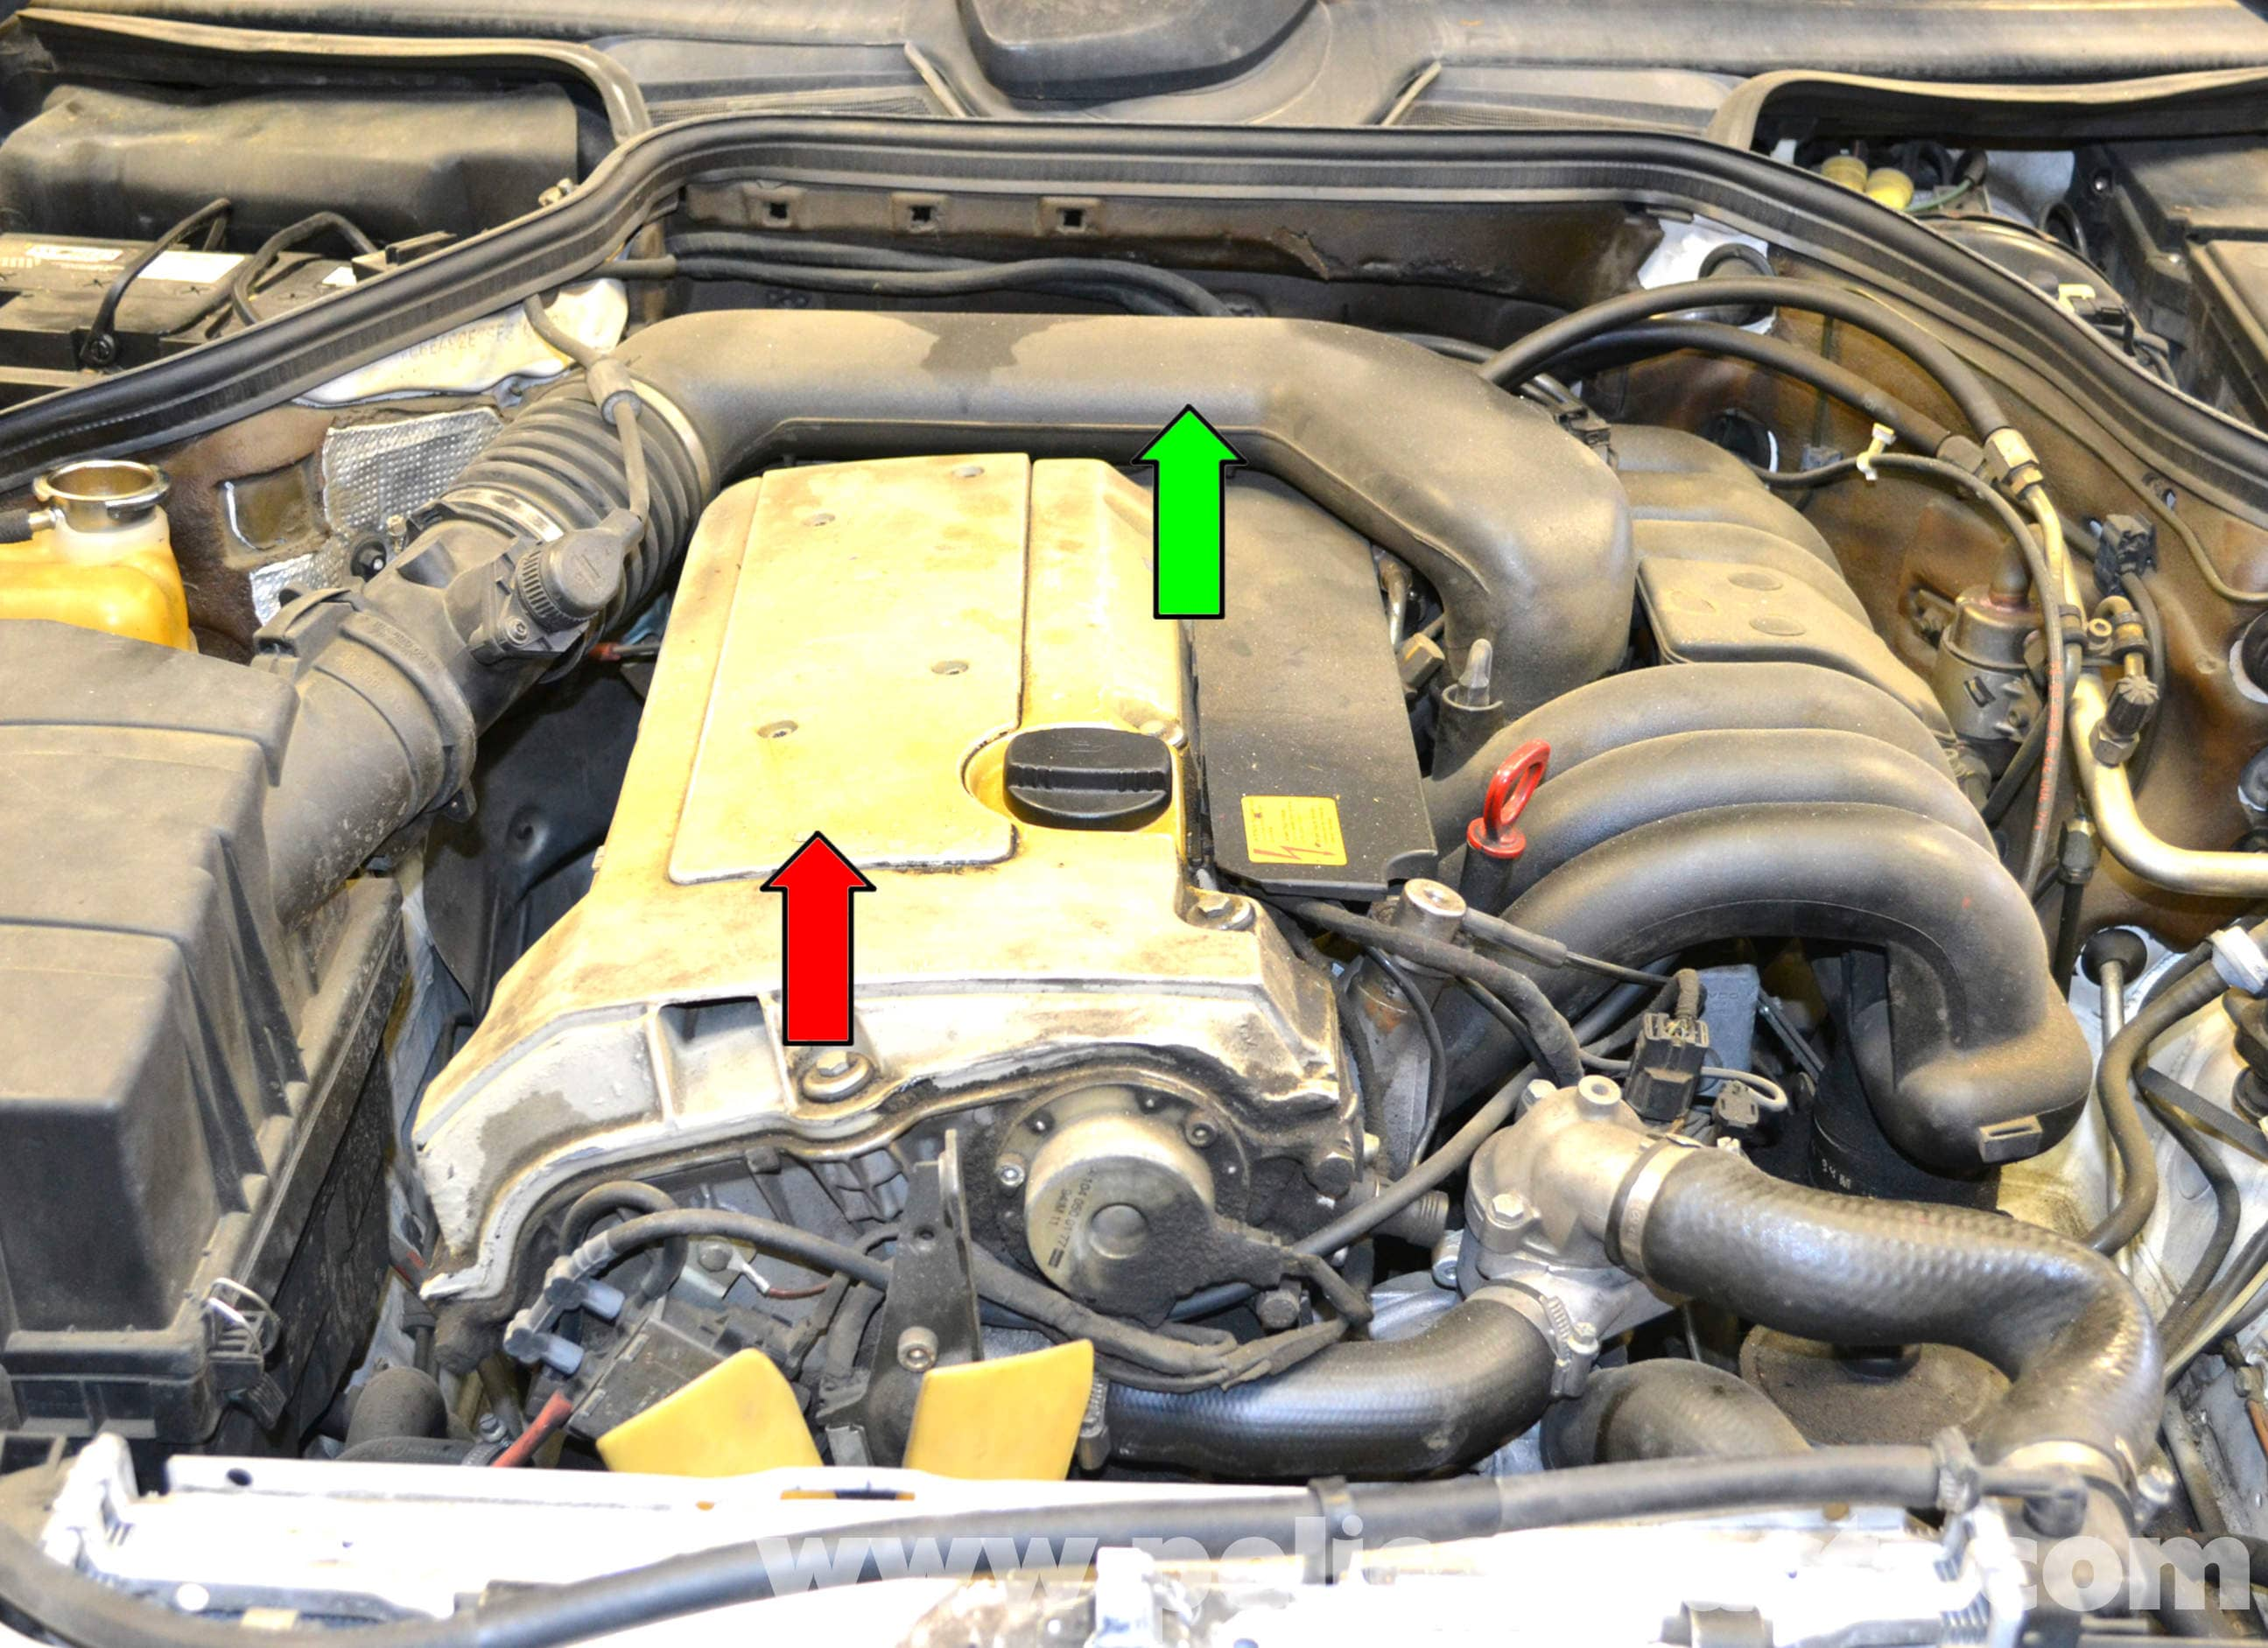 Mercedes E320 Fuse Diagram | Wiring Library29.icse-cloud09.me